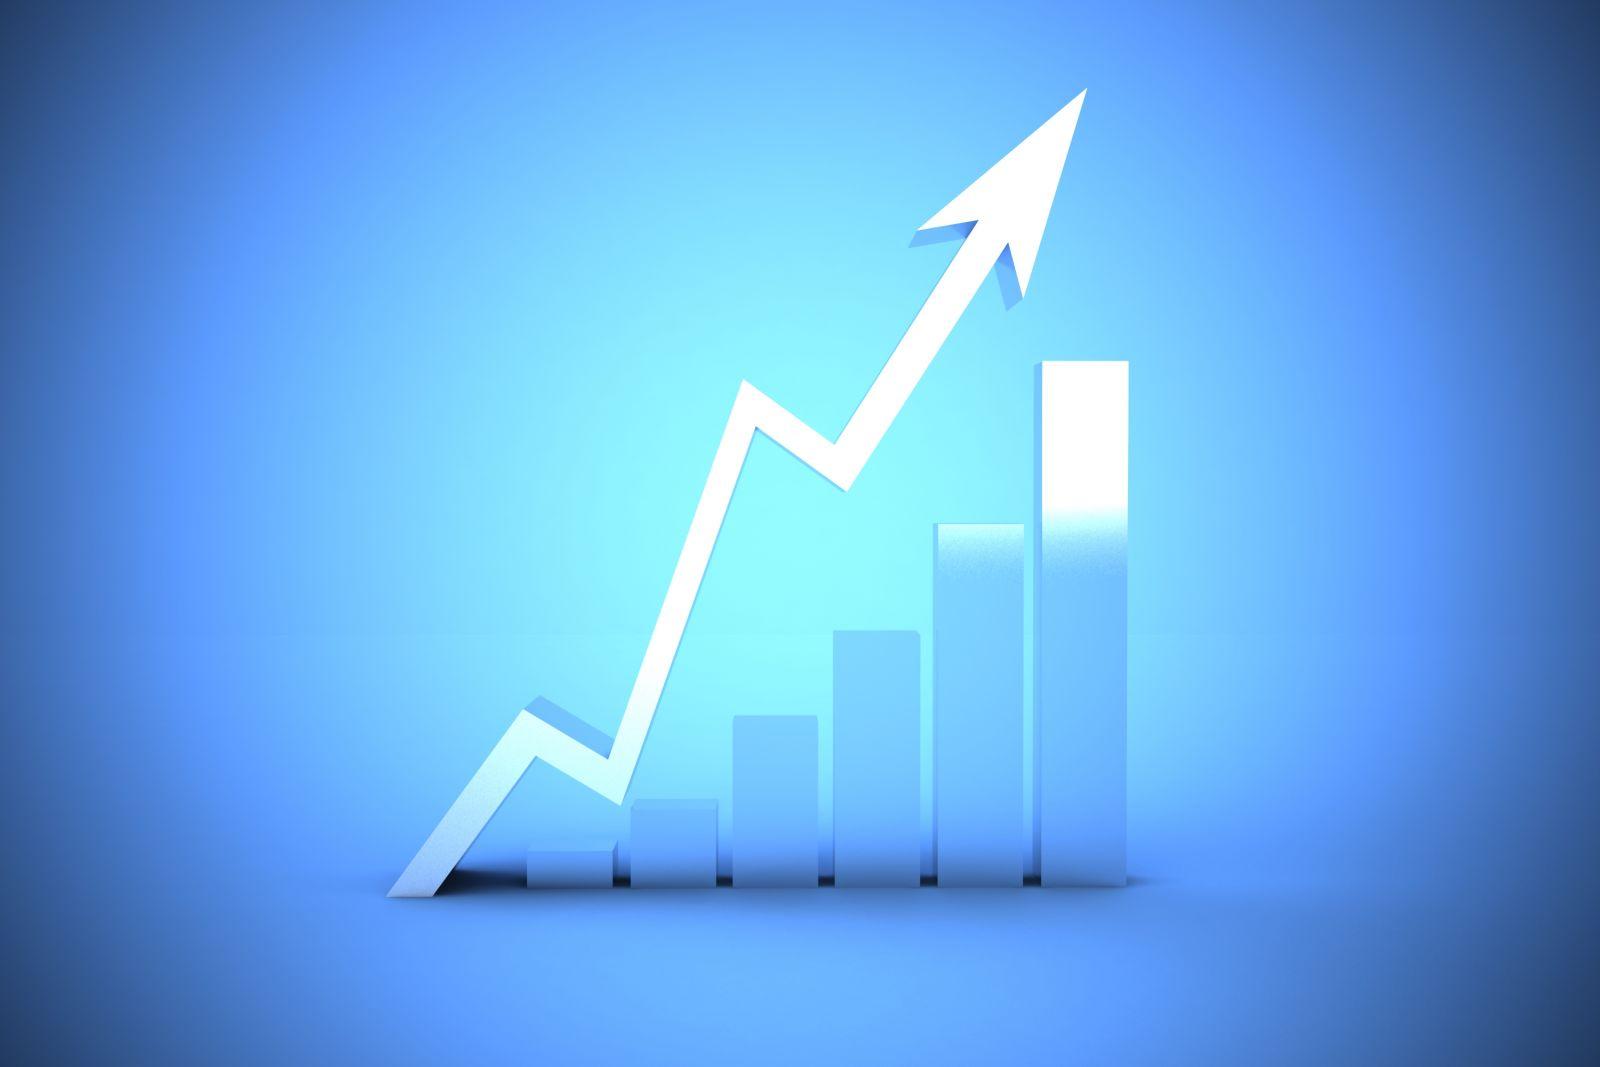 profit curve